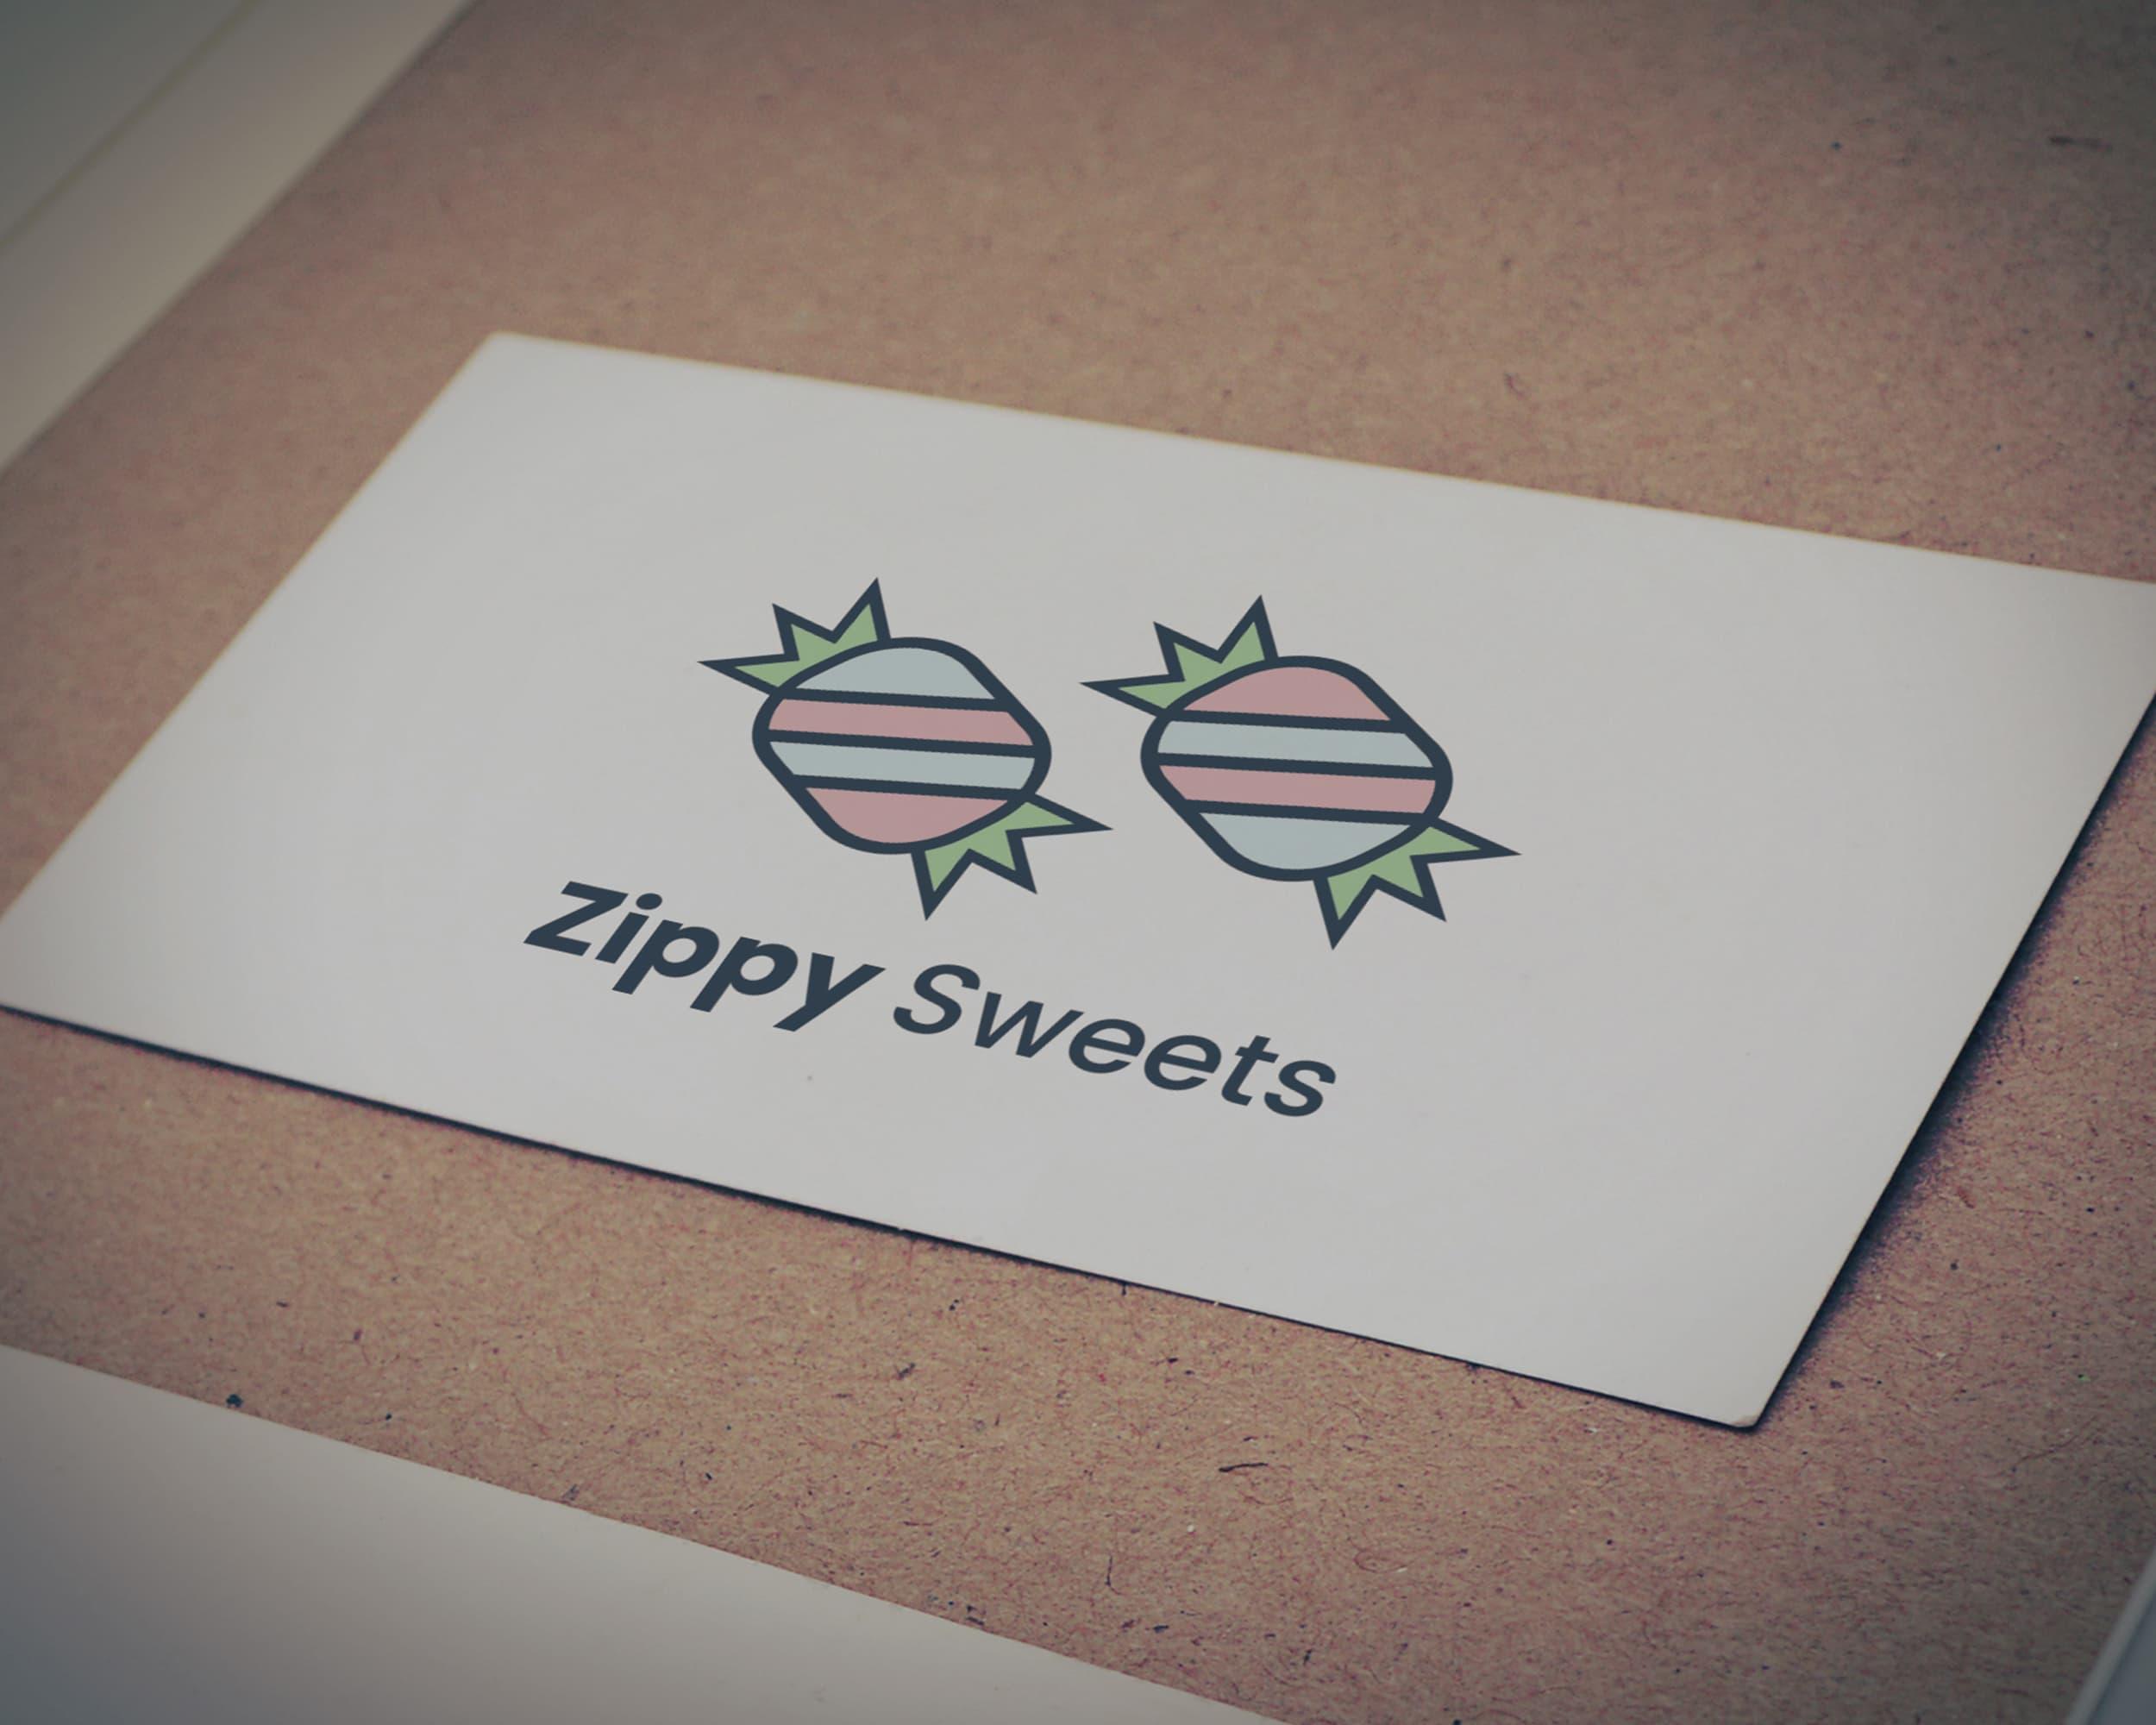 Zippy Sweets Logo Design